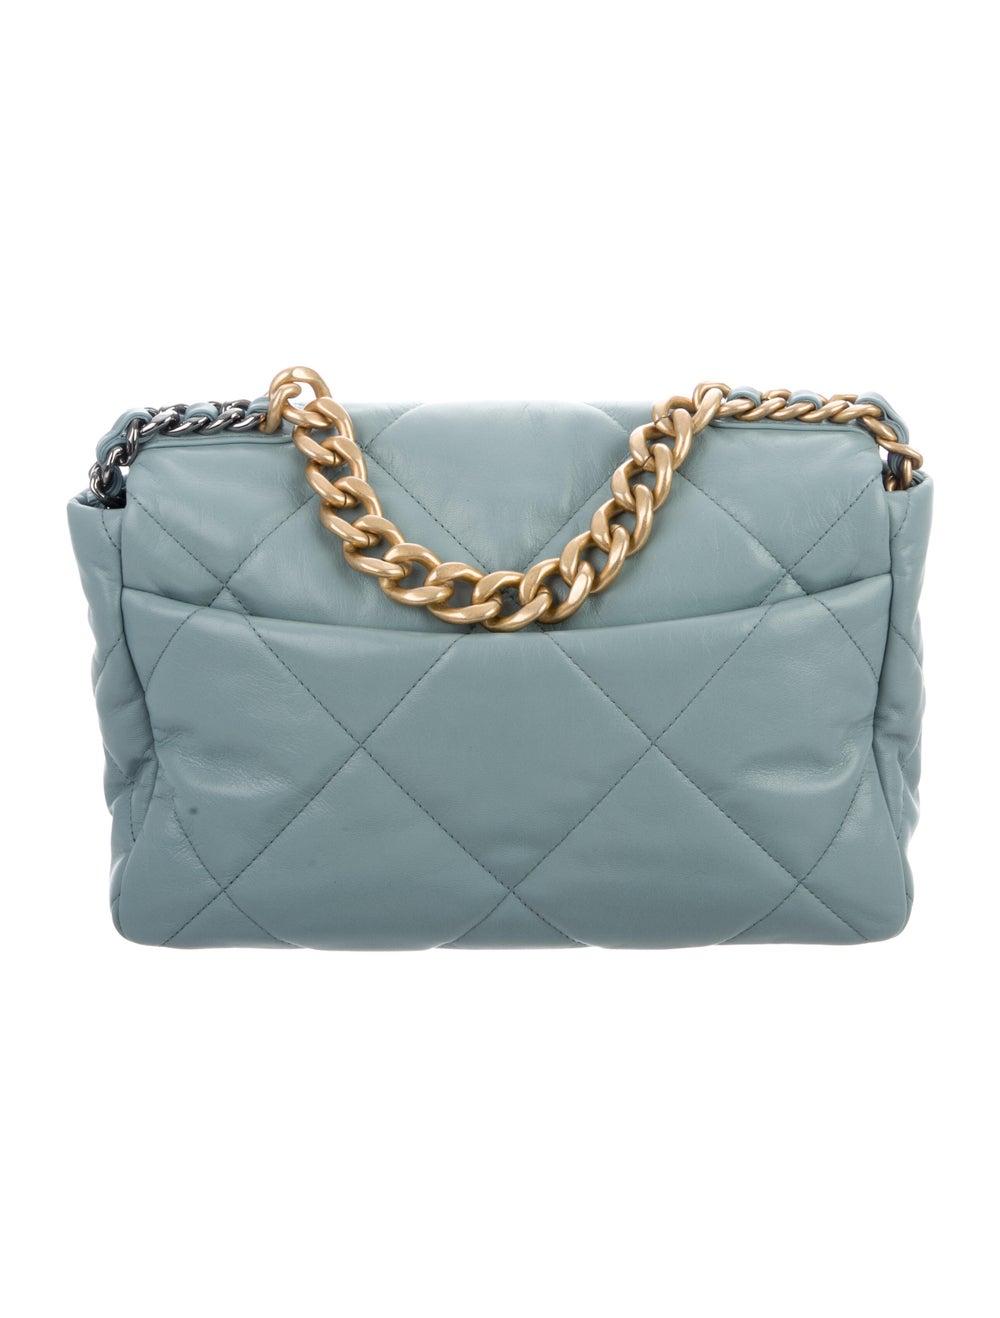 Chanel 2020 Large 19 Flap Bag Blue - image 4